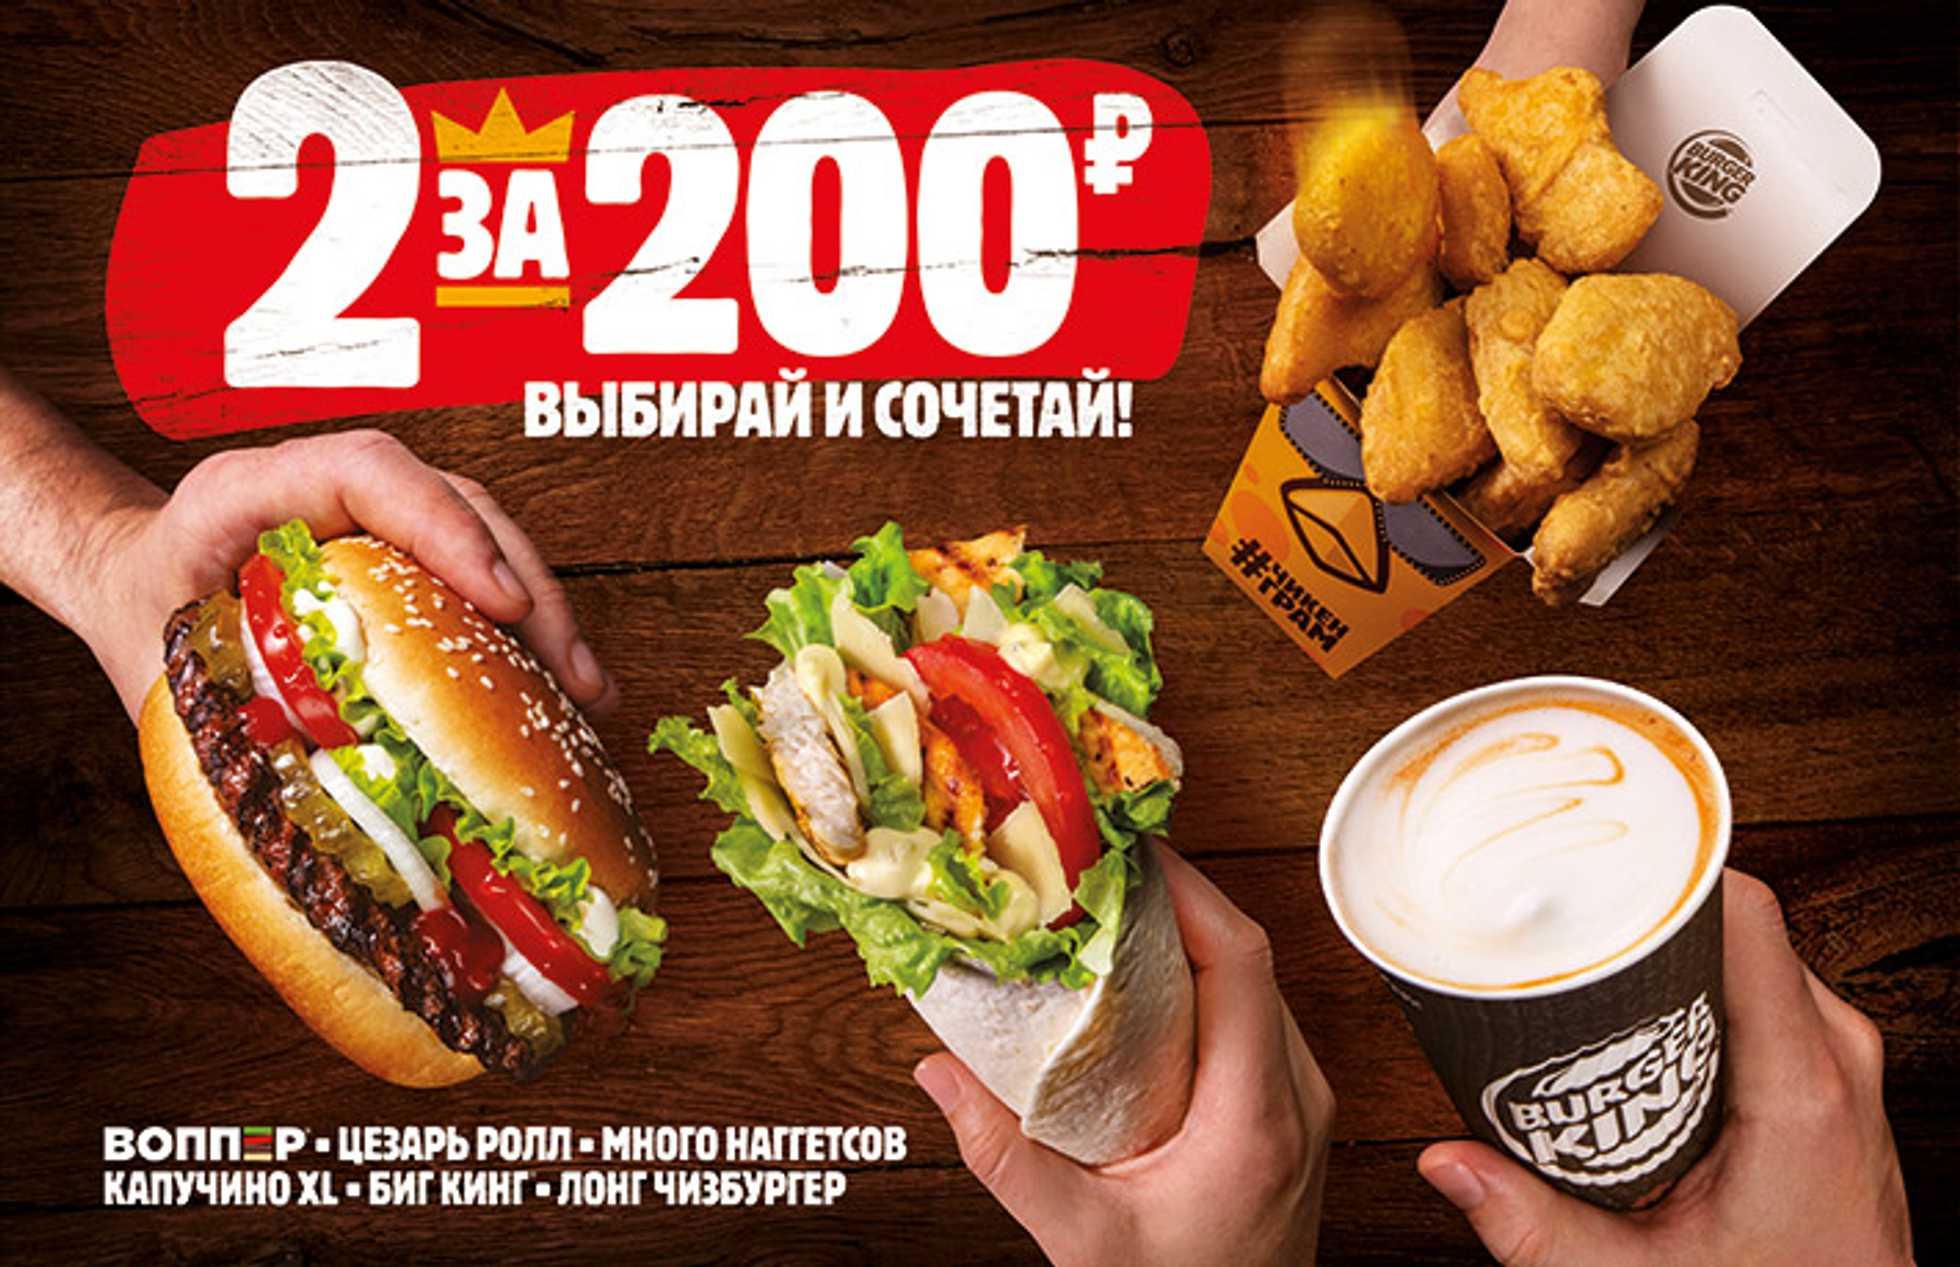 Бургер Кинг - каталог действителен с 05.06.2020 по 03.07.2020 - страница 1.